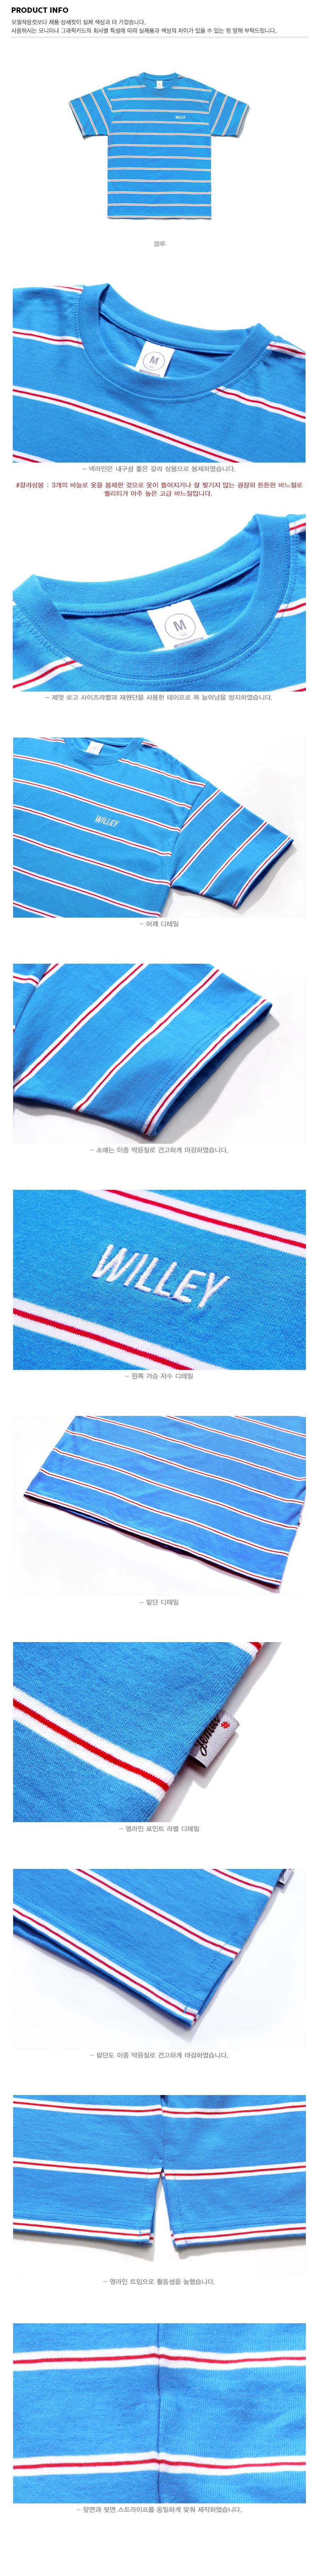 20180423_willey_stripe_t-shirts_blue_kj.jpg